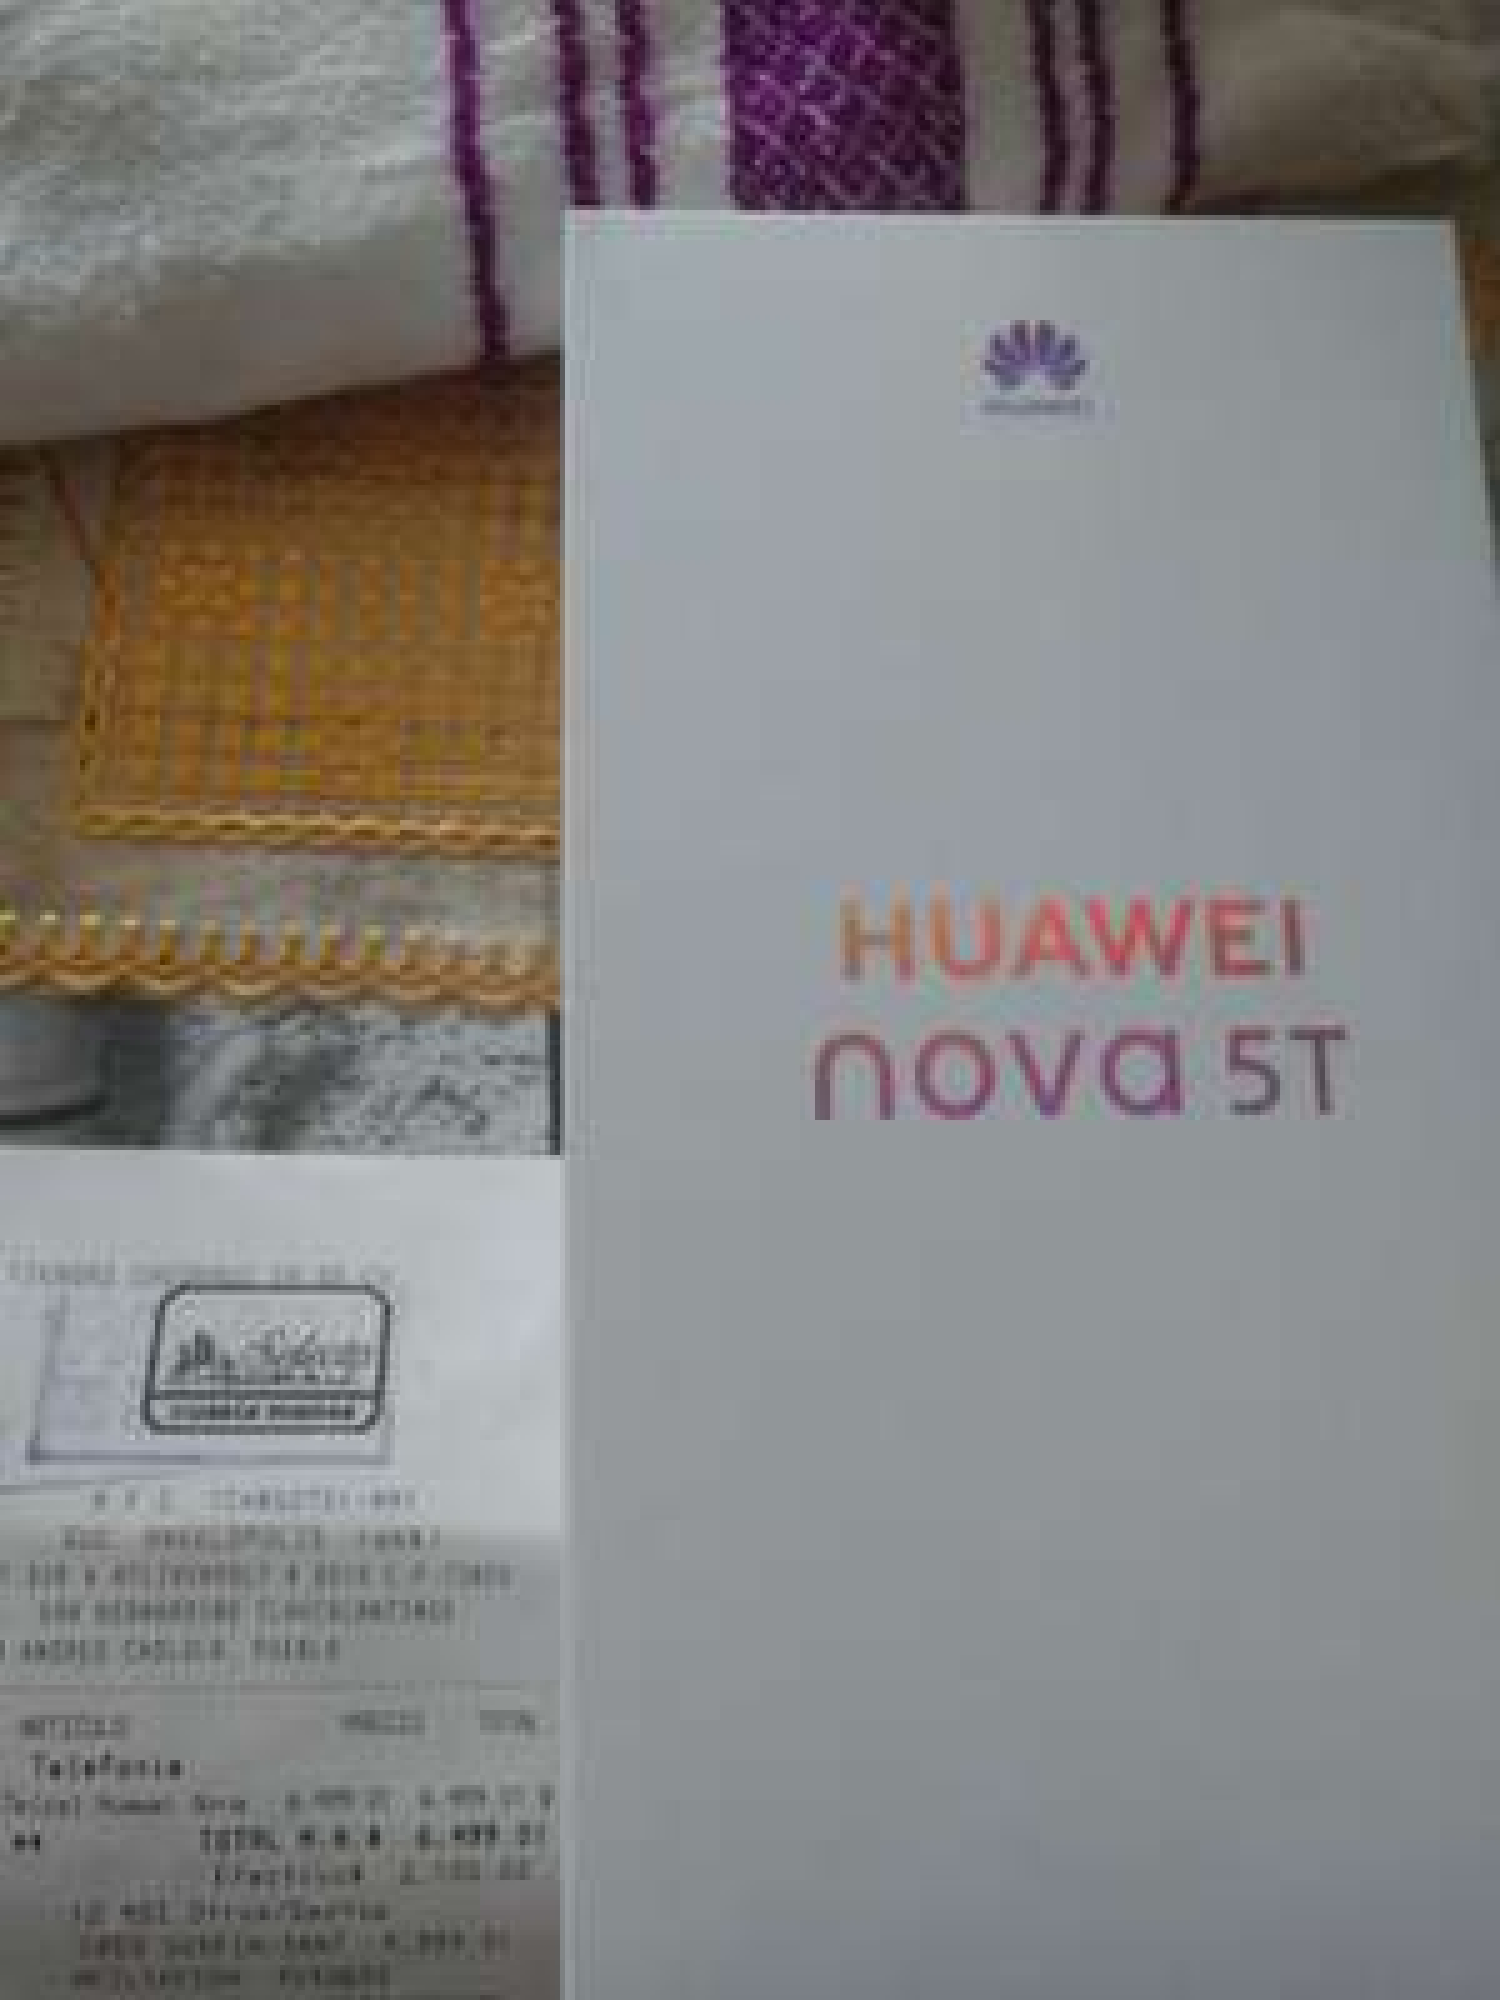 Chedraui Selecto: Huawei Nova 5t